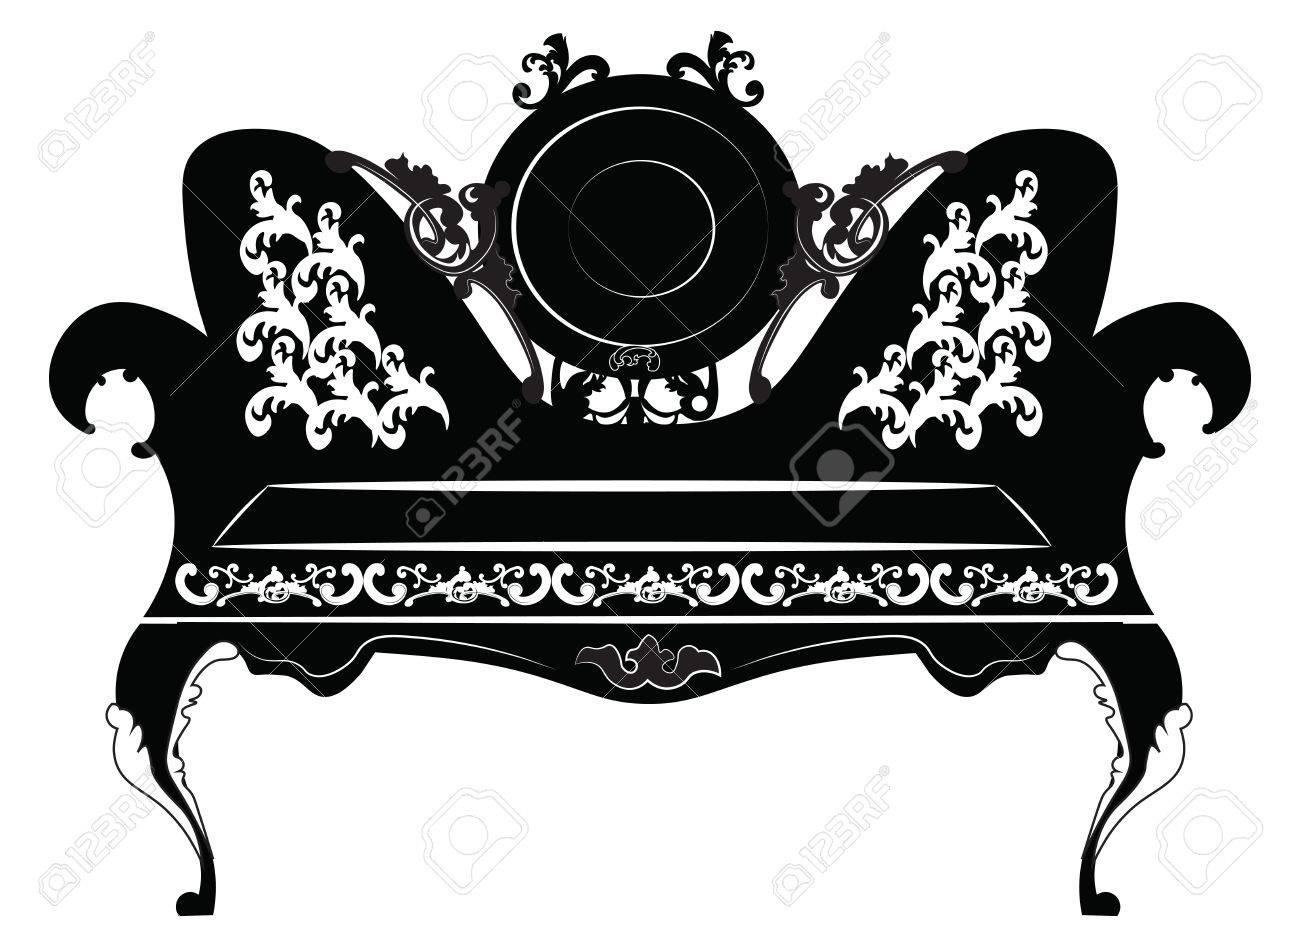 Standard Bild   Vektor Jahrgang Barock Sofa Möbel Runde Mit Luxuriösen  Schmuck Geformt. Vektor Skizze